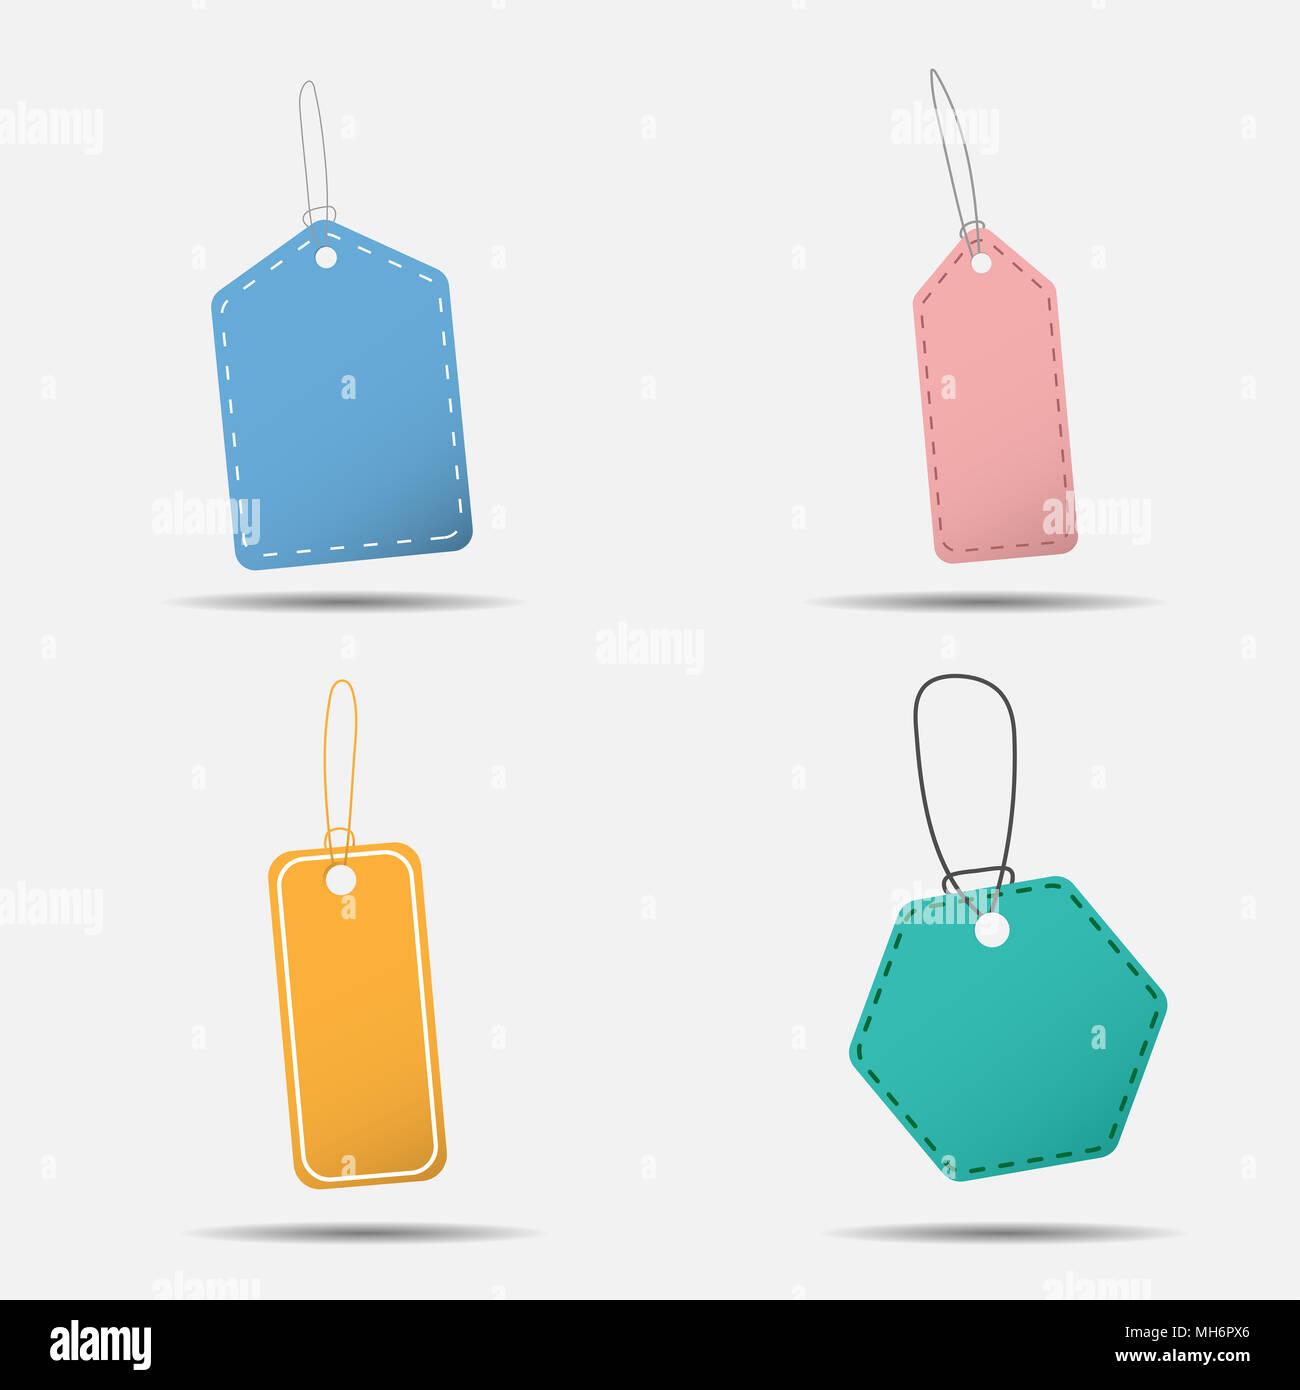 Colorful hang sale tag, illustration eps10 - Stock Image